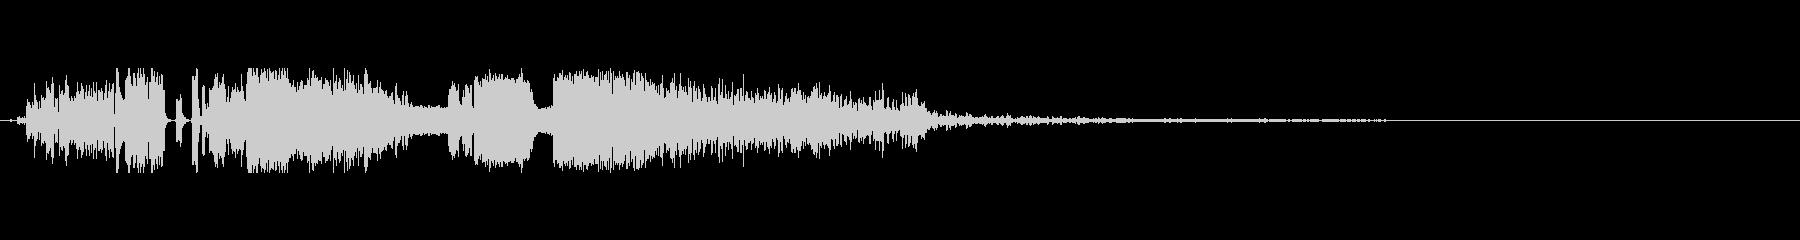 FMジングル DJドロップ の未再生の波形